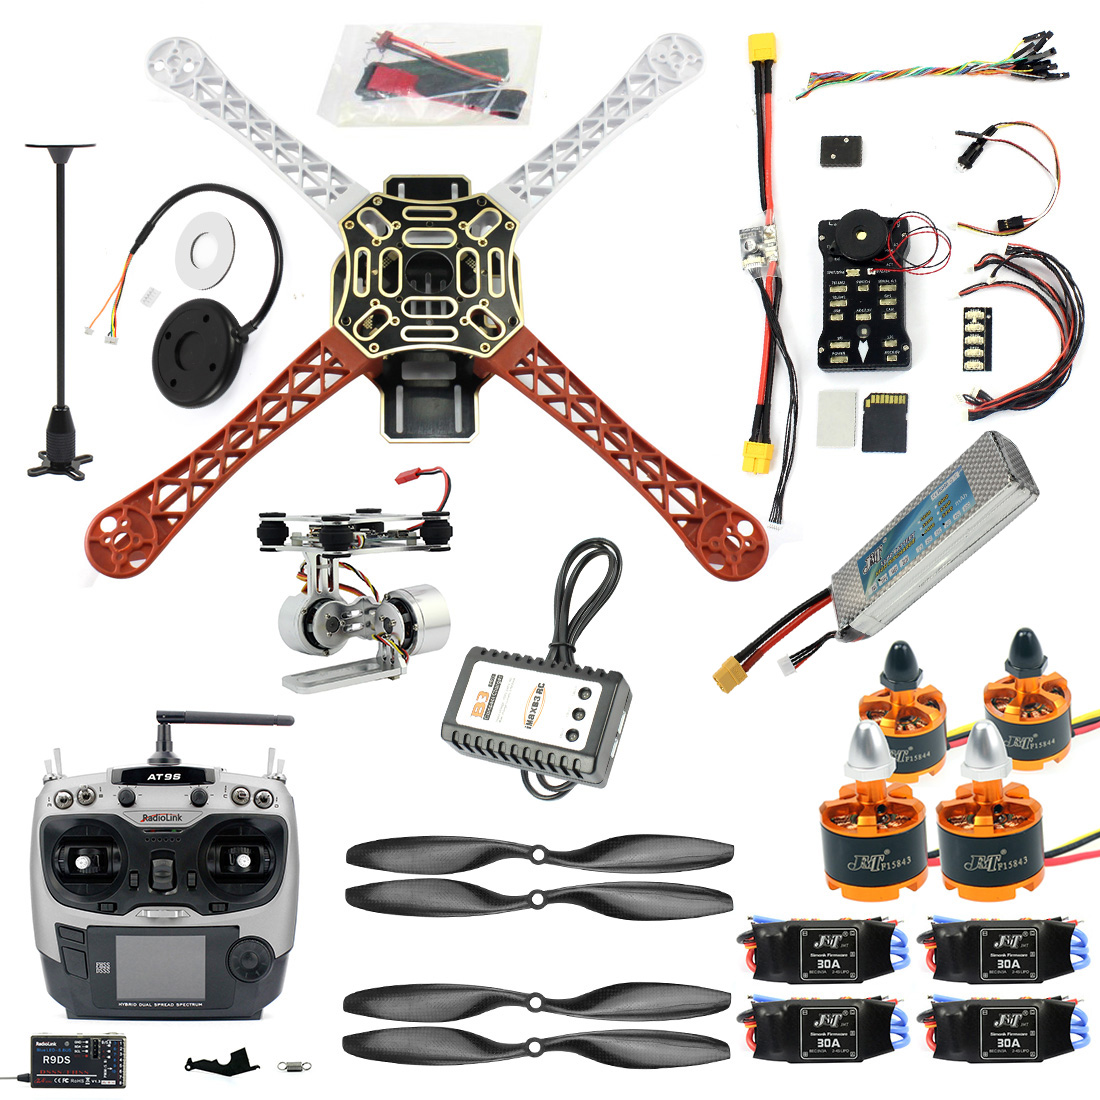 DIY FPV Drone Quadcopter 4 axle Aircraft Kit F450 450 Frame PXI PX4 Flight Control 920KV